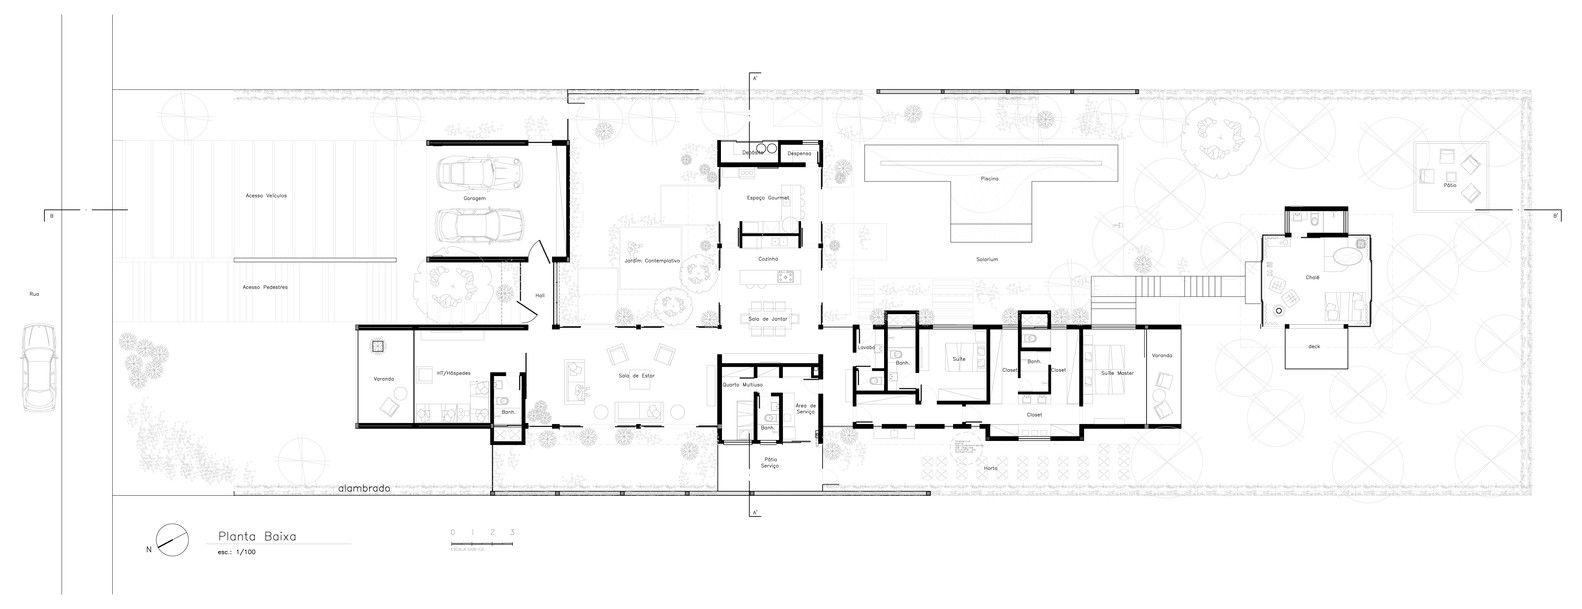 Galería de Casa ME / Otta Albernaz Arquitetura - 26